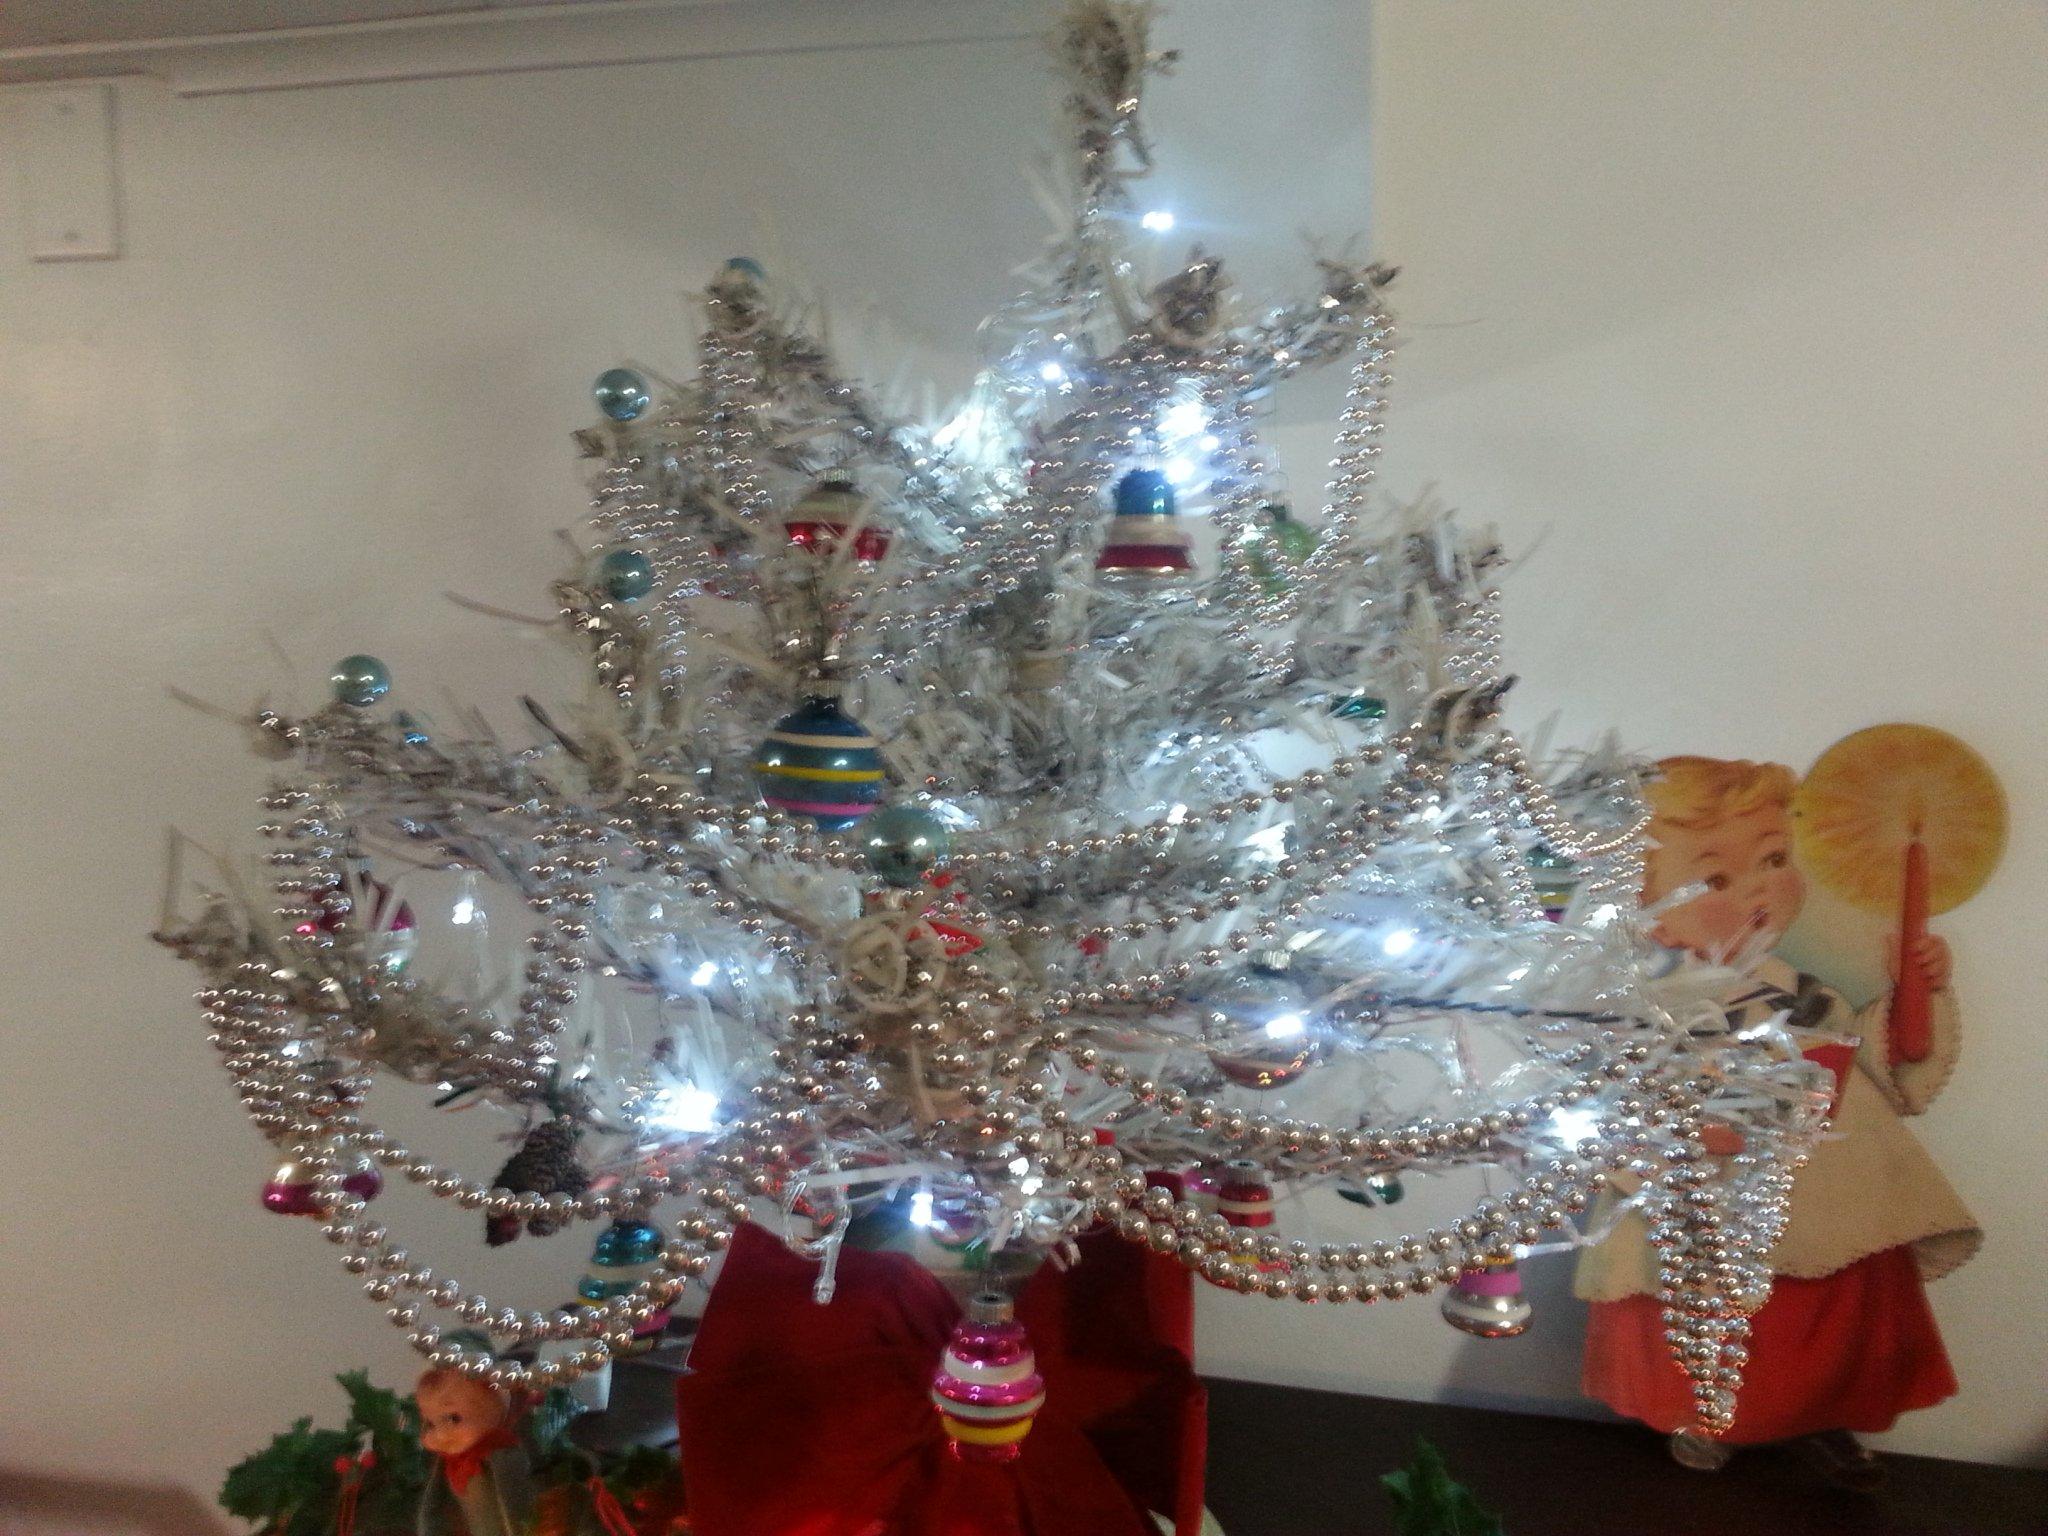 Tinselmania: 219 vintage aluminum Christmas trees - Retro ...